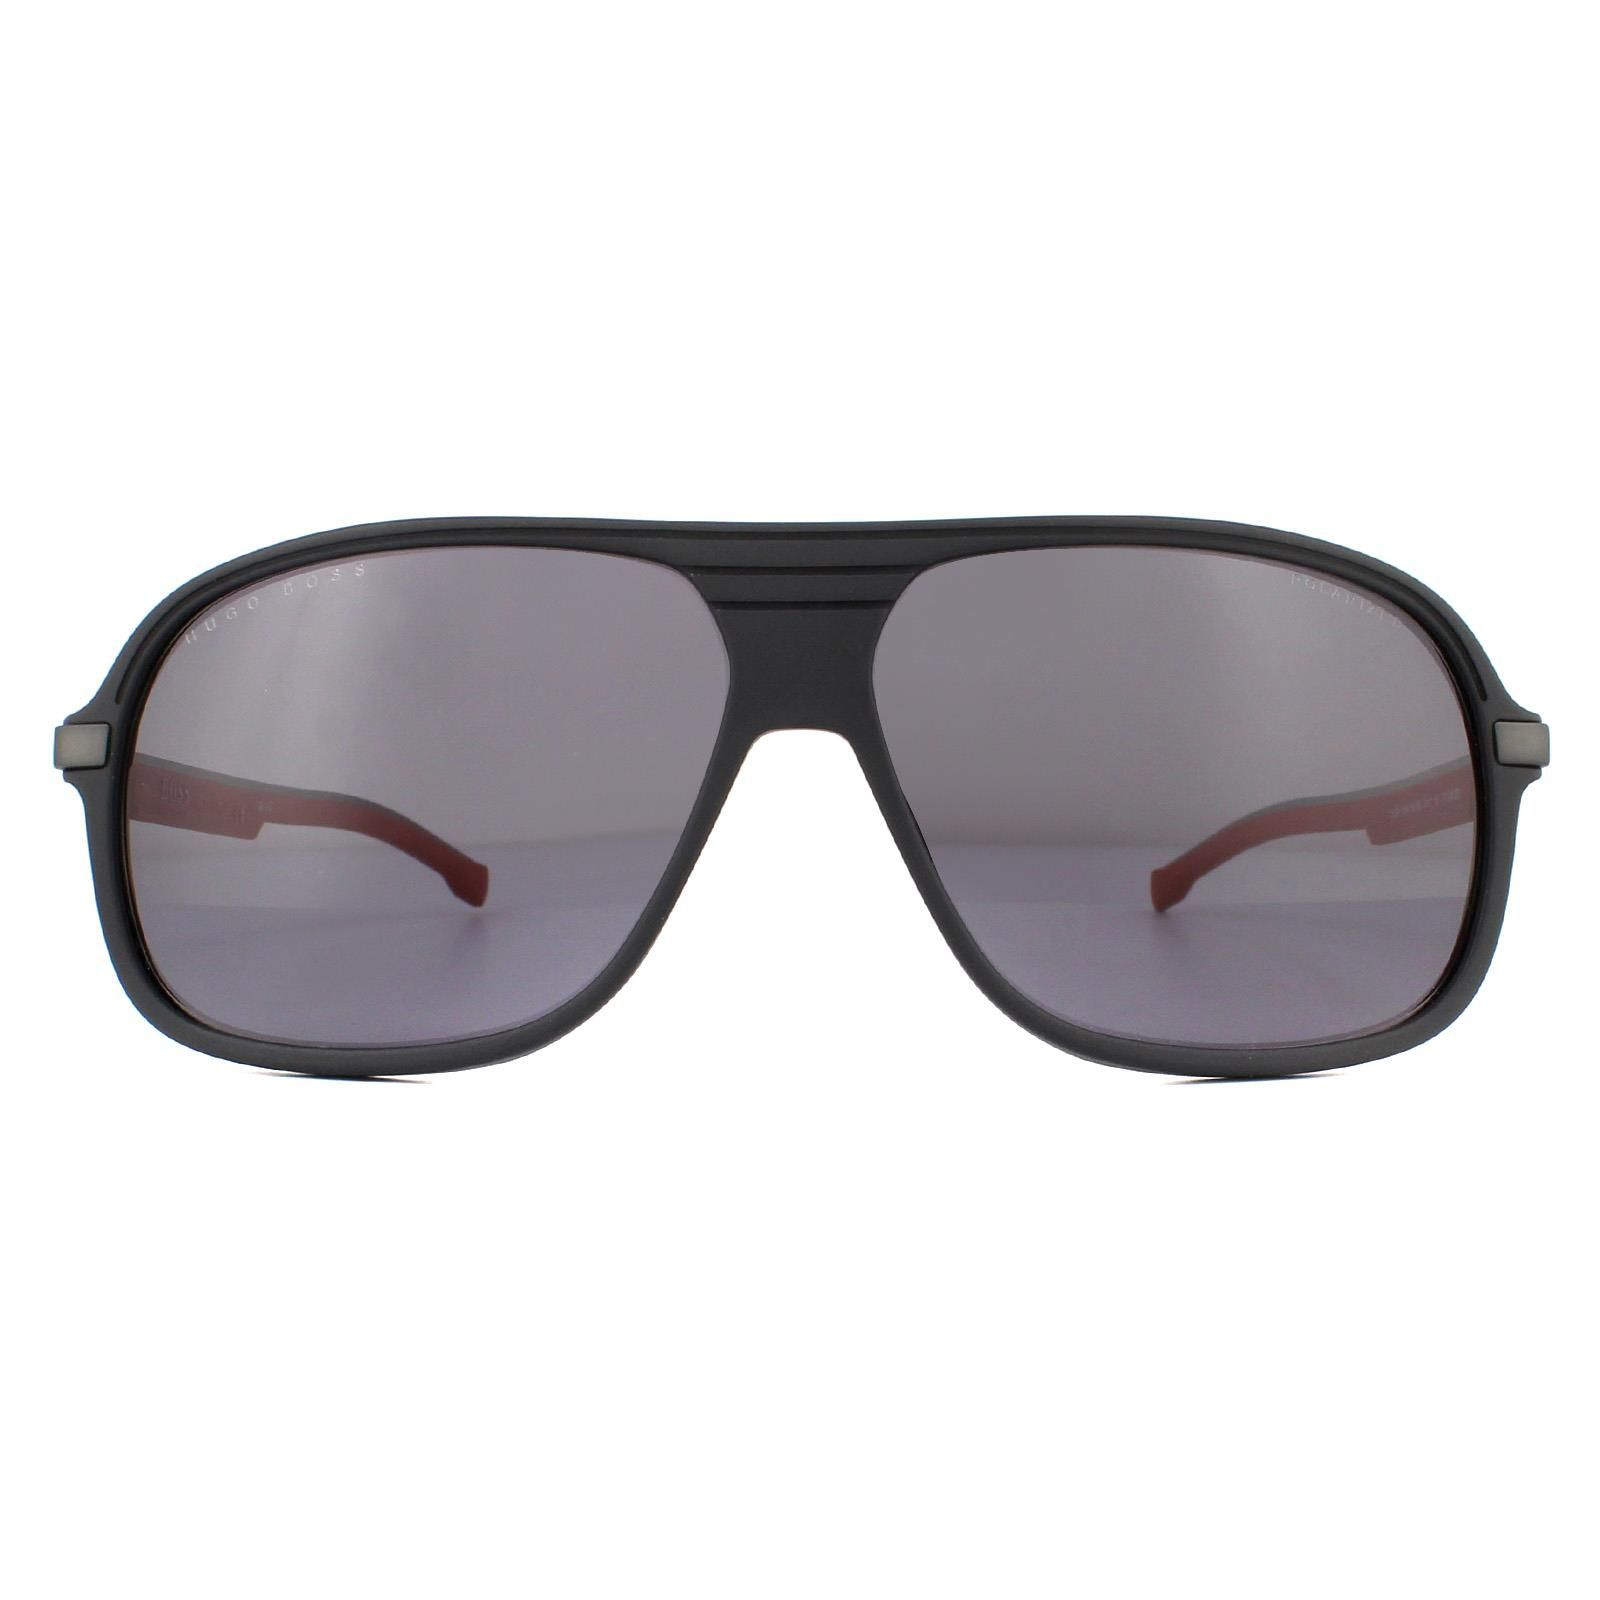 Hugo Boss Sunglasses BOSS 1200/S BLX/M9 Matte Black Red Grey Polarized